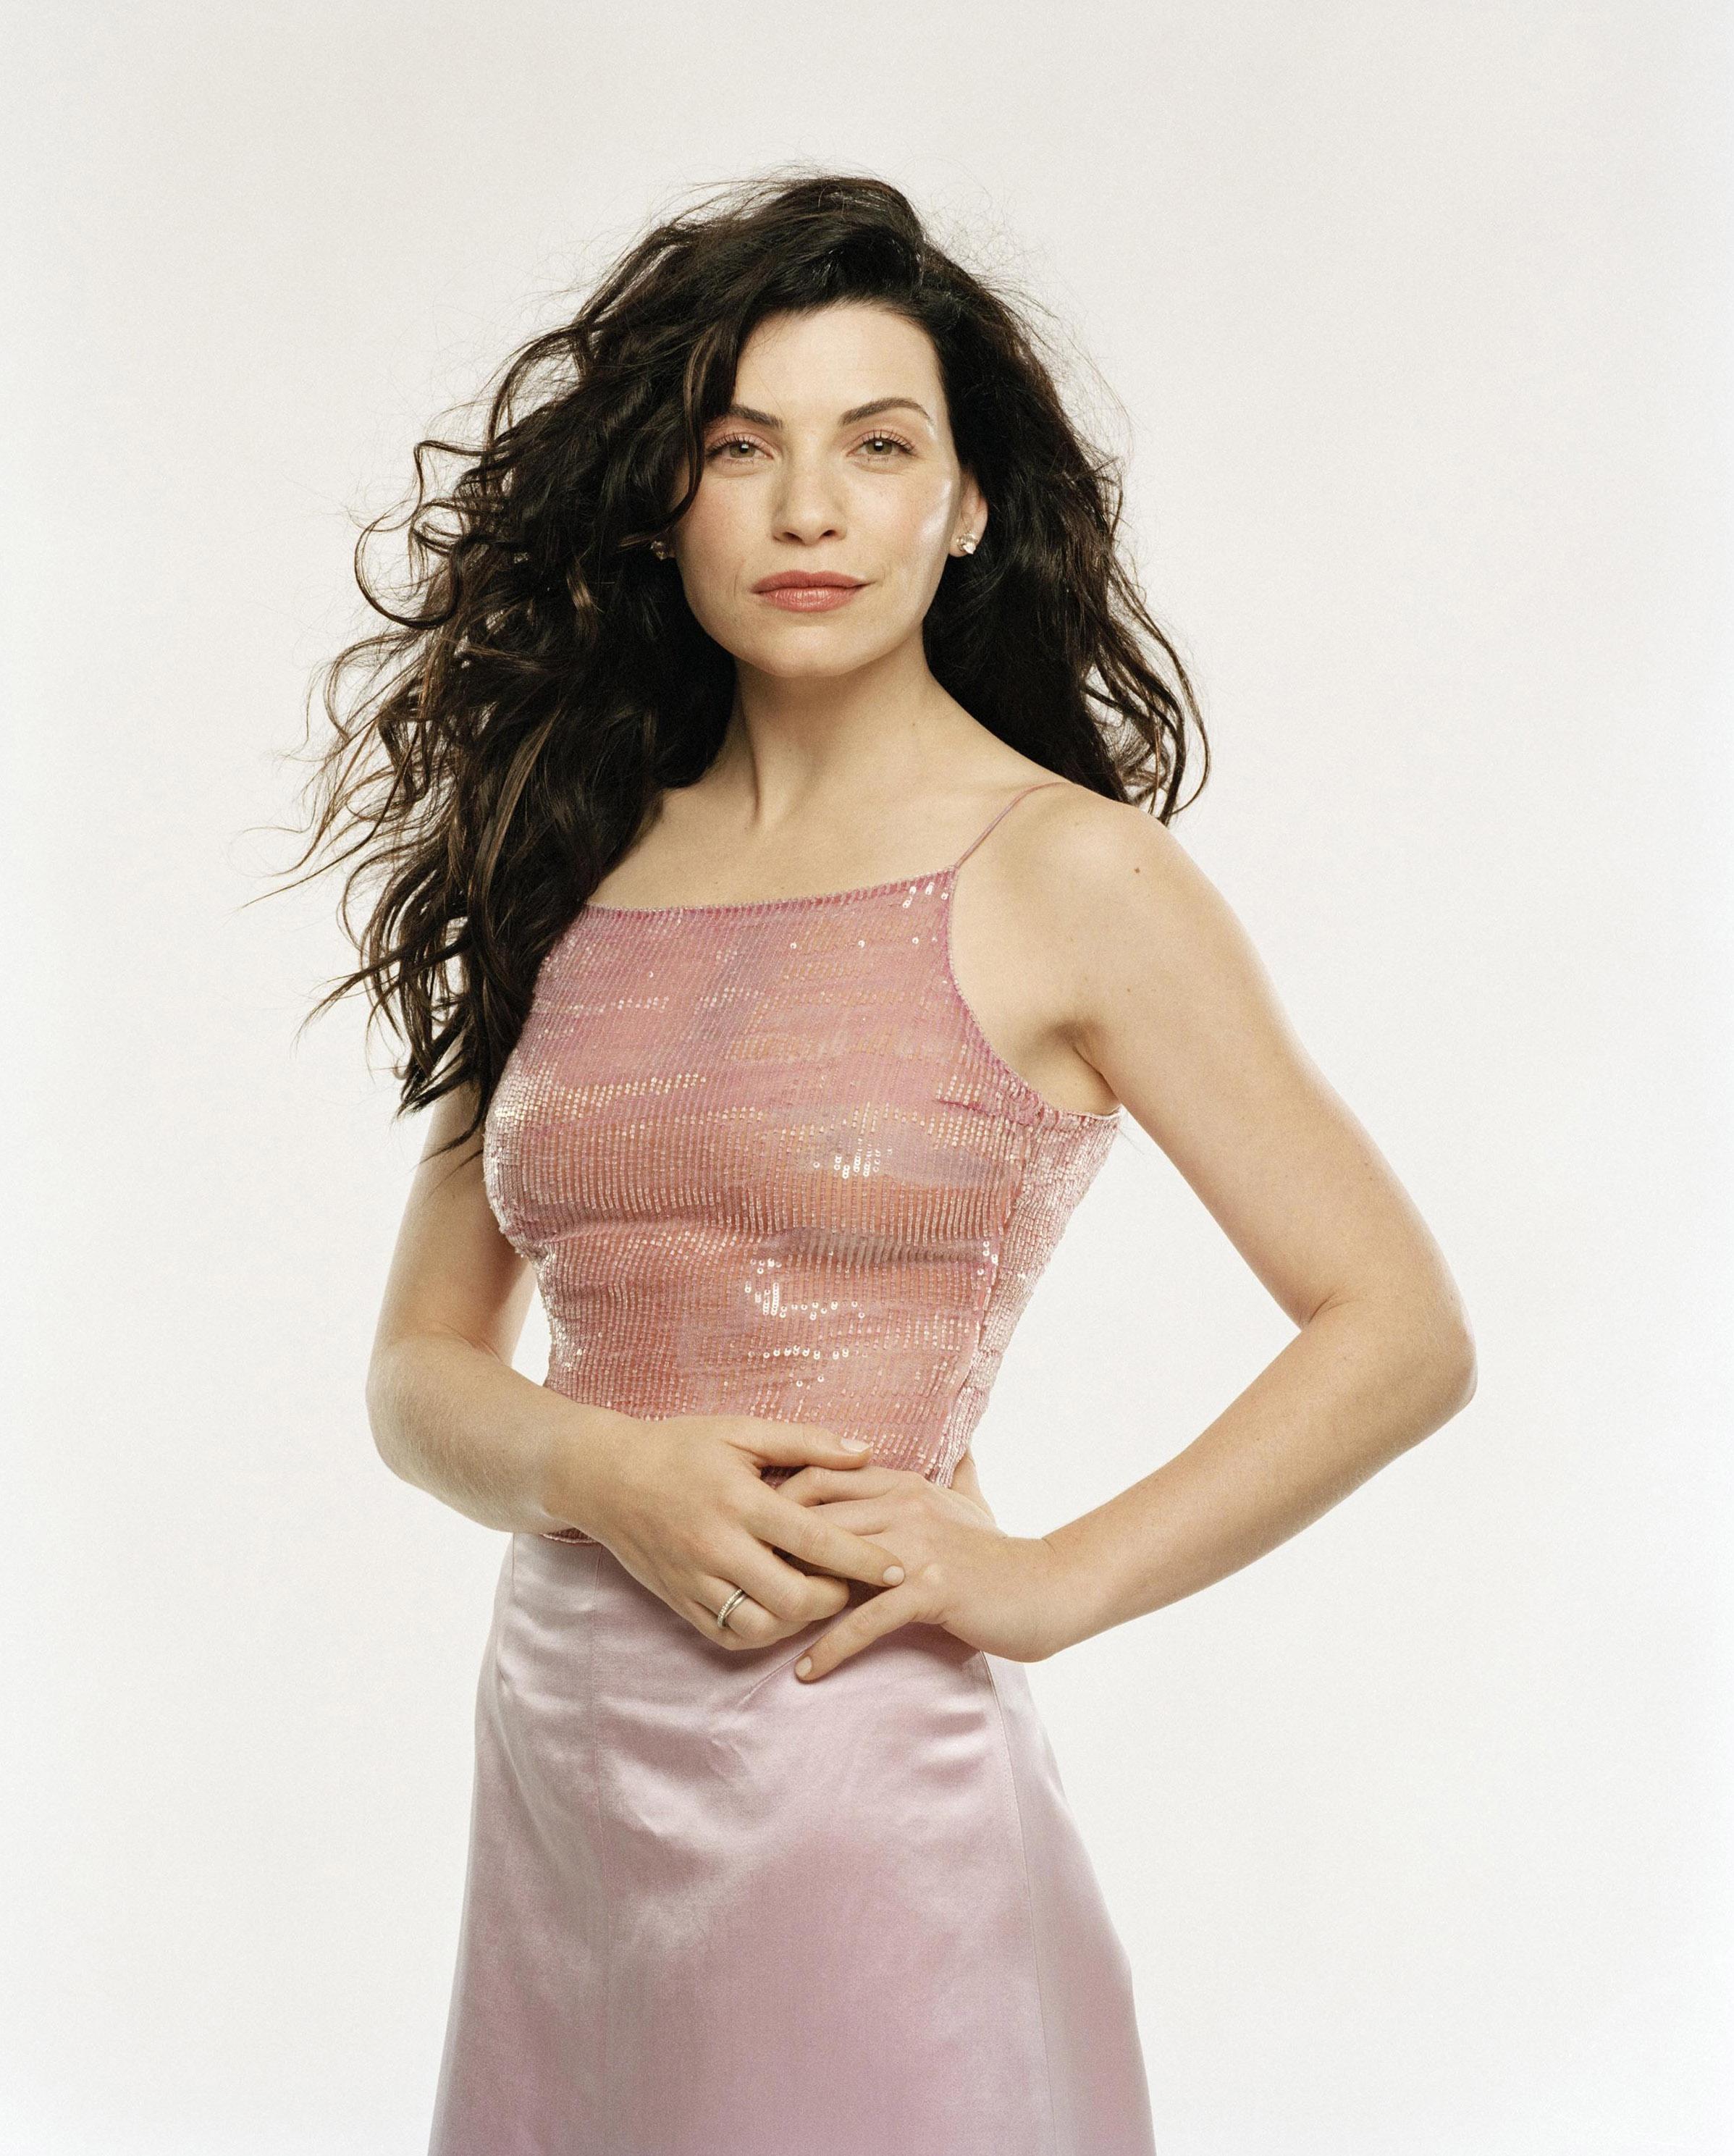 Arianne Zucker born June 3, 1974 (age 44),Preetha Vijayakumar XXX clips Rafaela Ottiano,Tram-Anh Tran